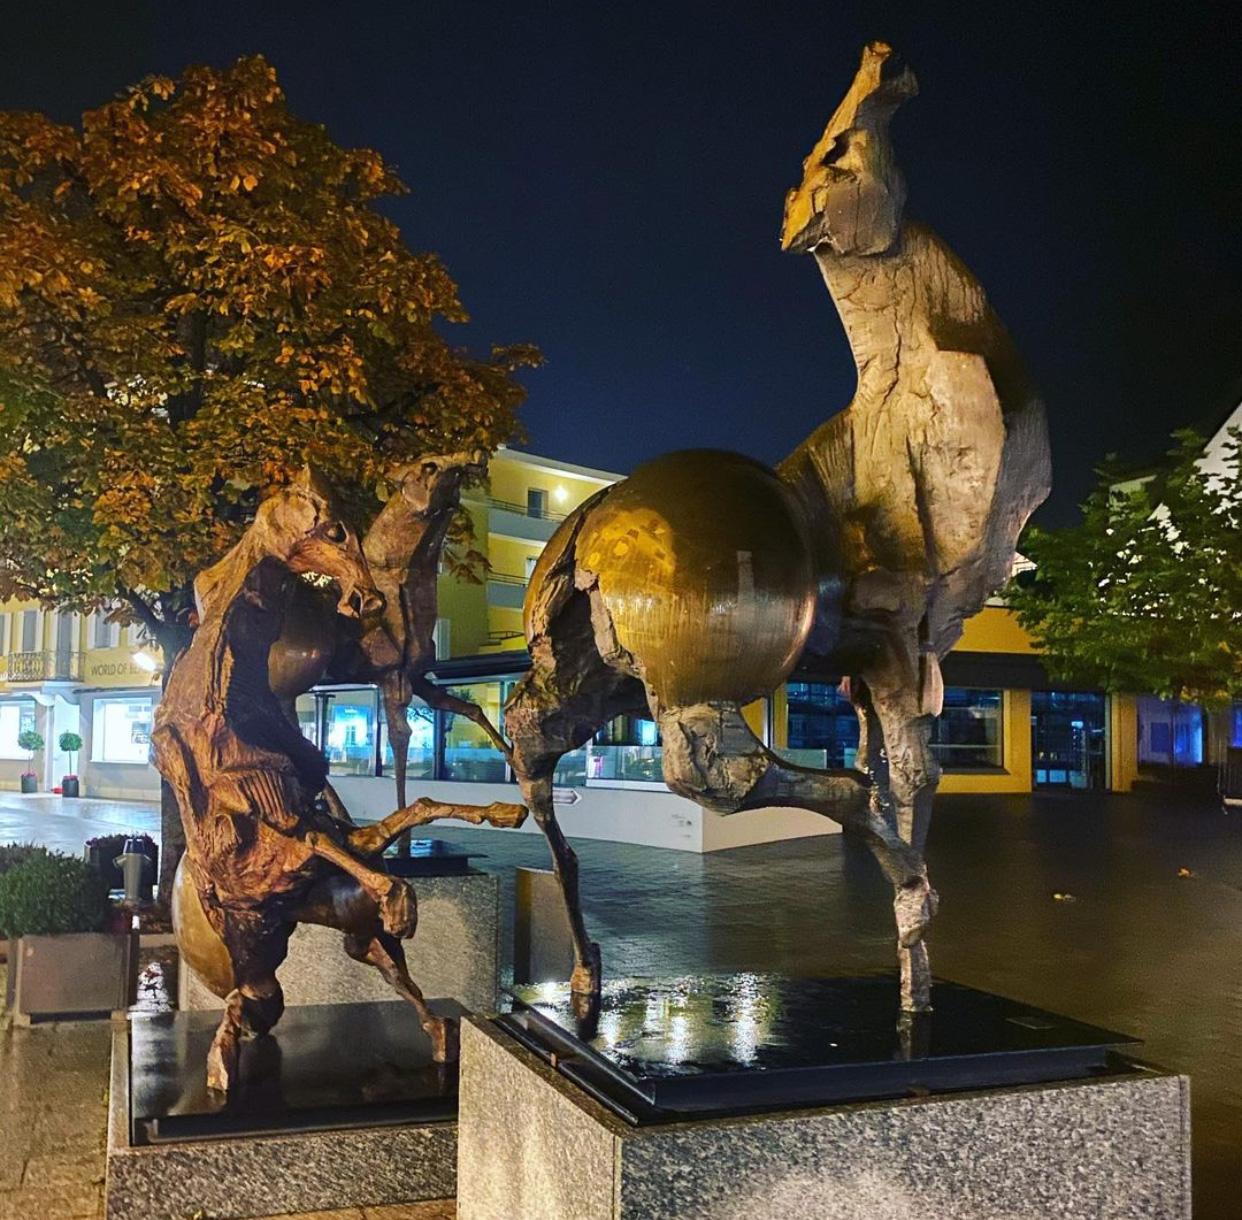 Large war horse sculptures